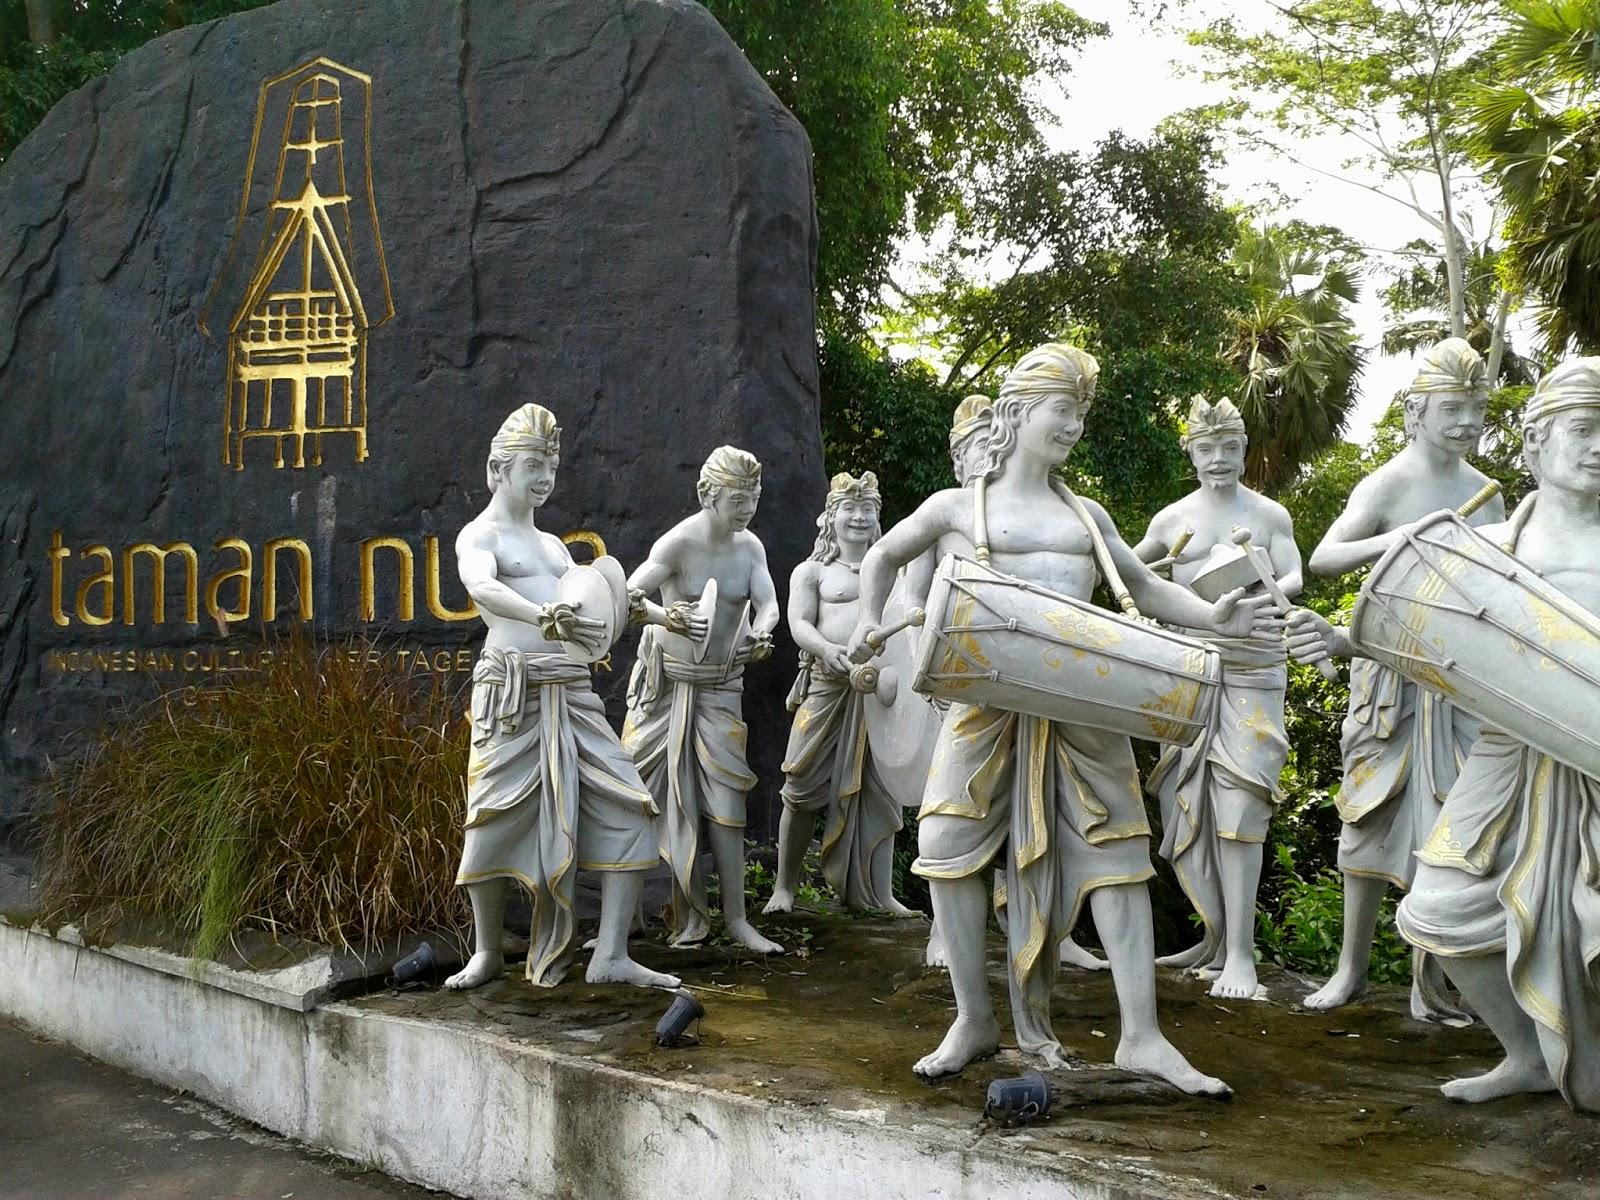 Blogodok Blegedek Keliling Indonesia Taman Nusa Gianyar Jadi Jangan Khawatir